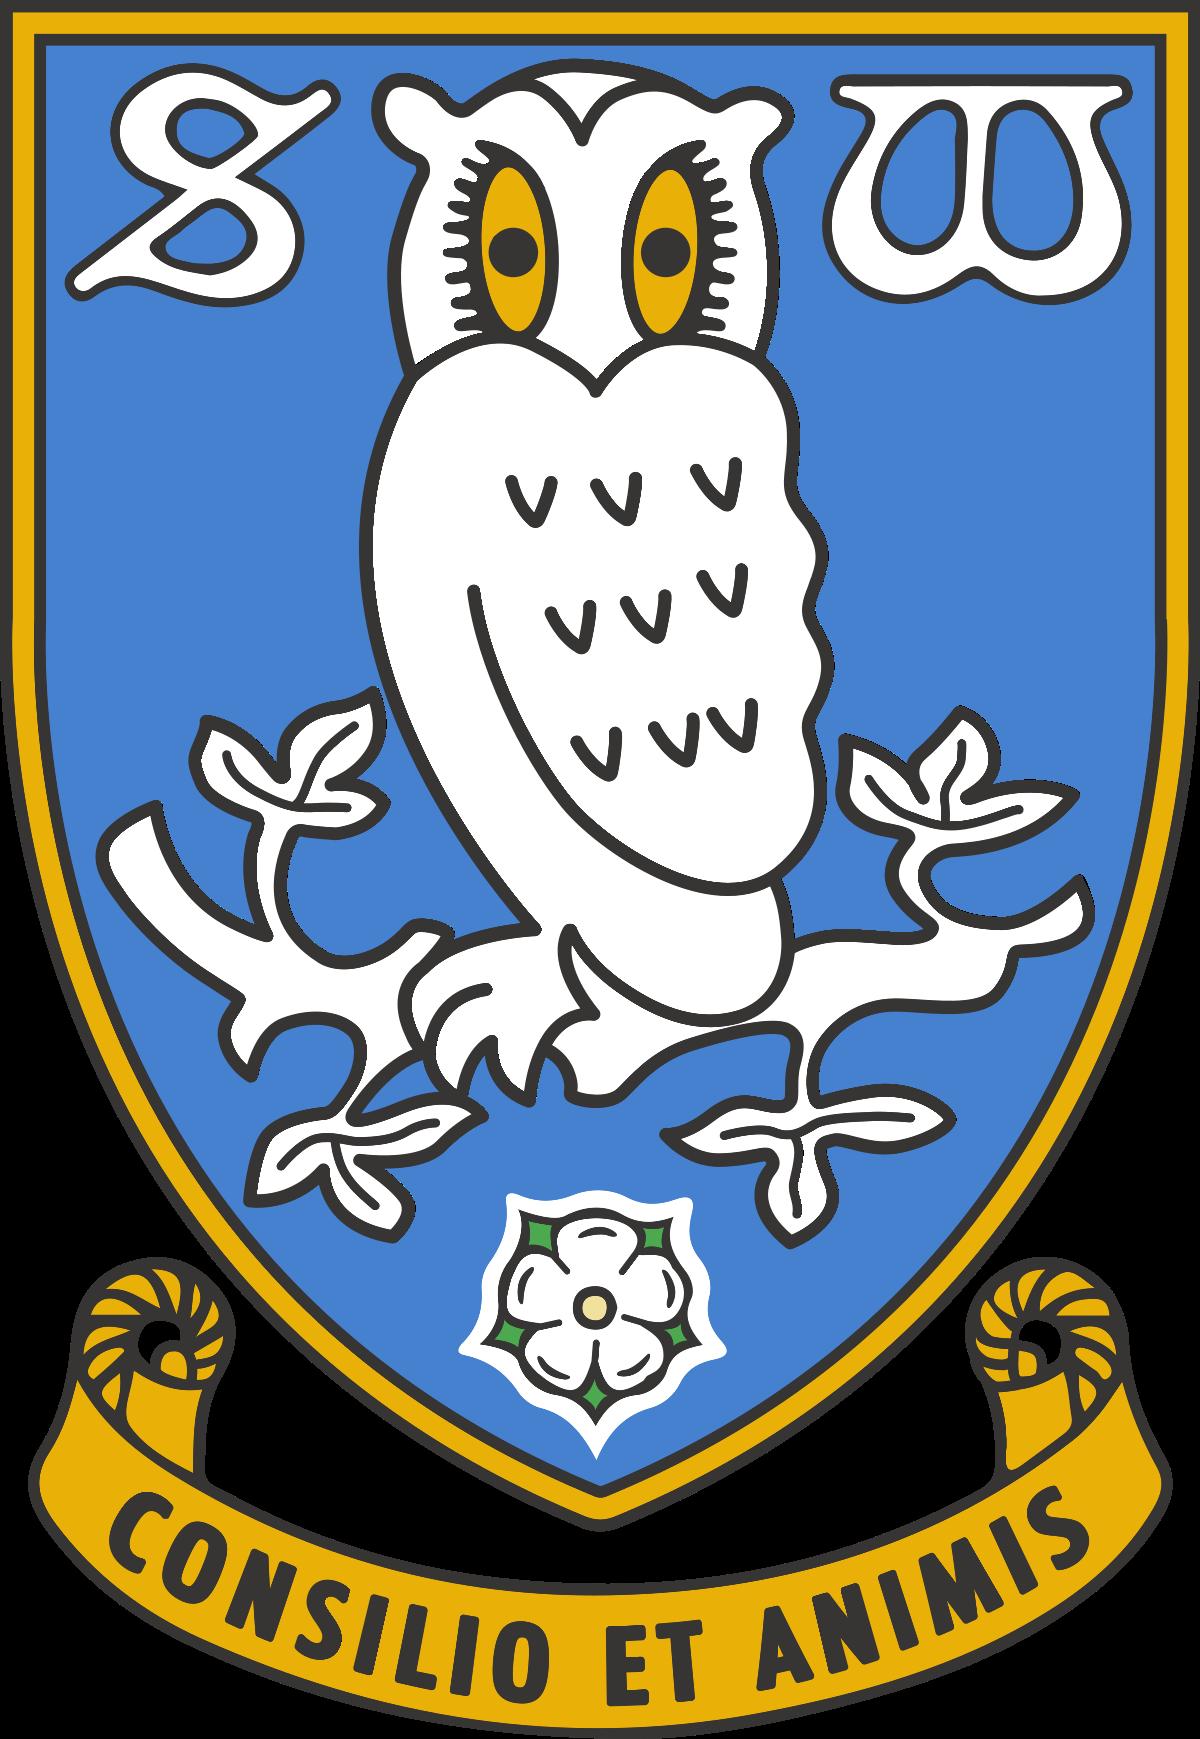 Sheffield Wednesday crest